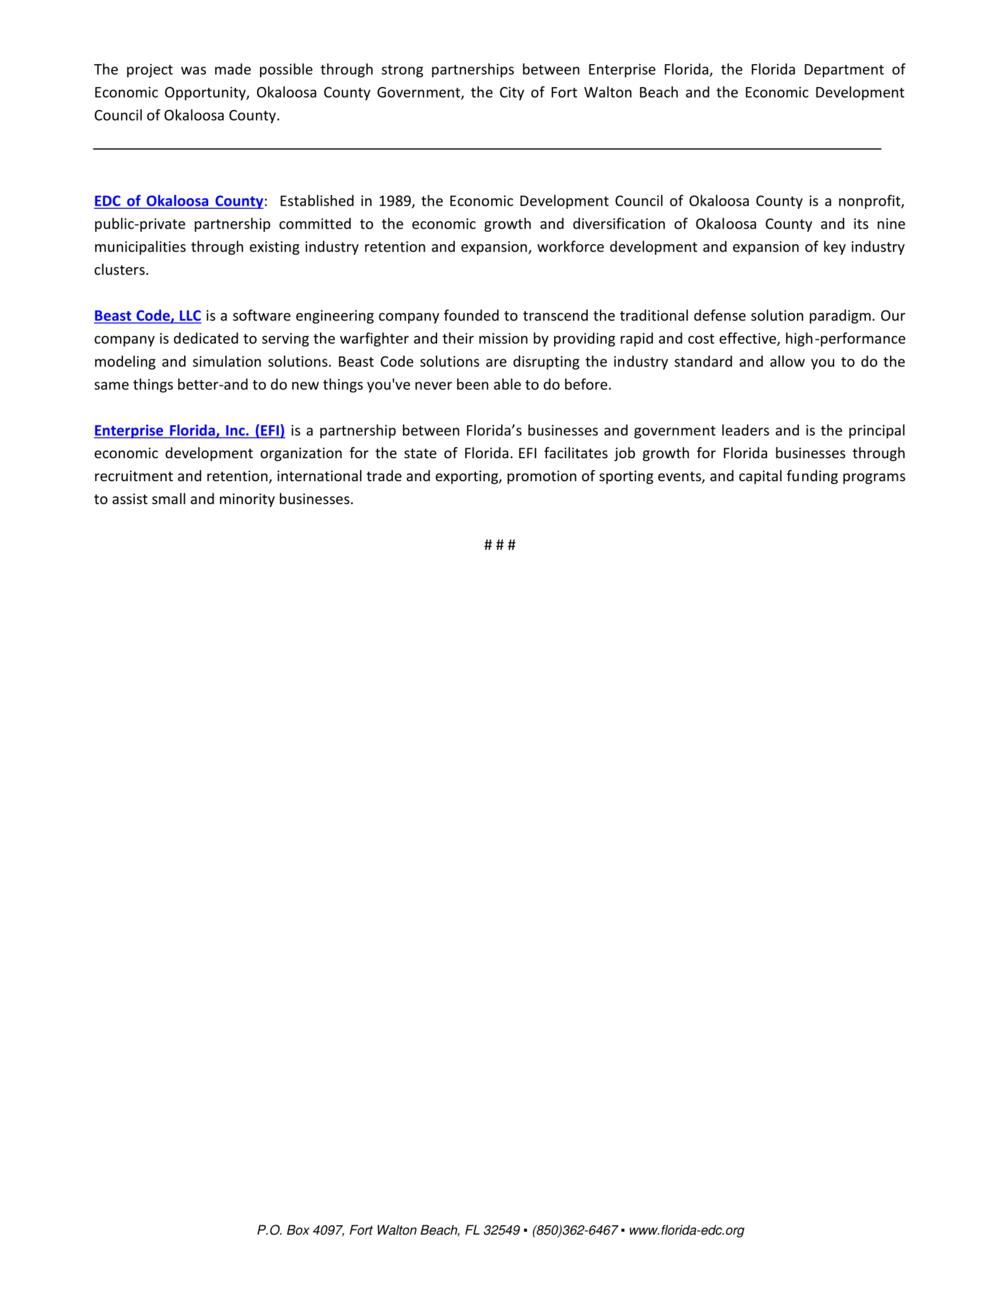 Beast Code Press Release - 9.17.18-2.png